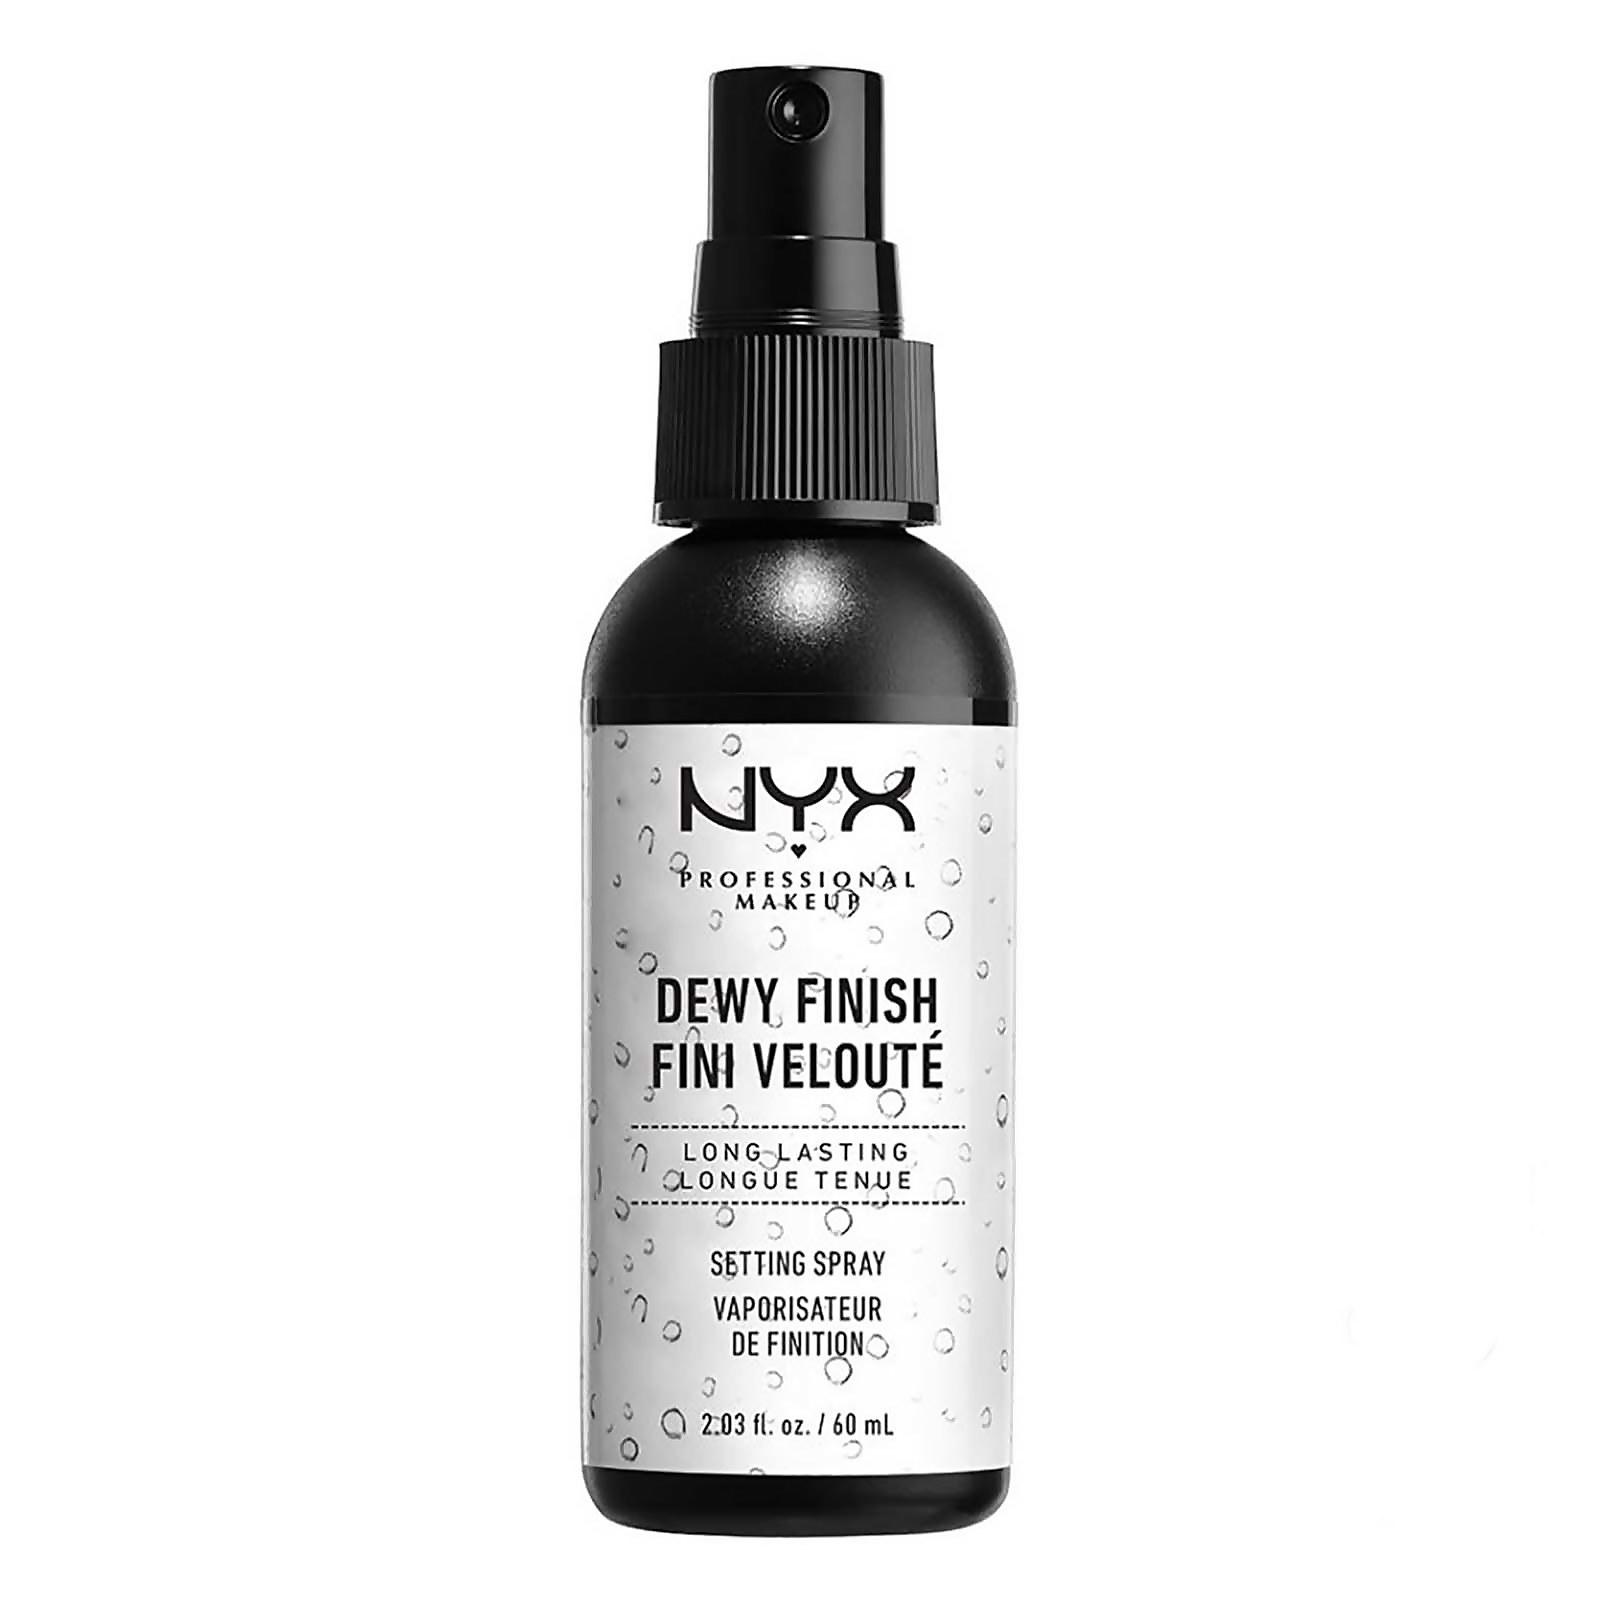 Купить Спрей-фиксатор макияжа NYX Professional Makeup Make Up Setting Spray - Dewy Finish/Long Lasting